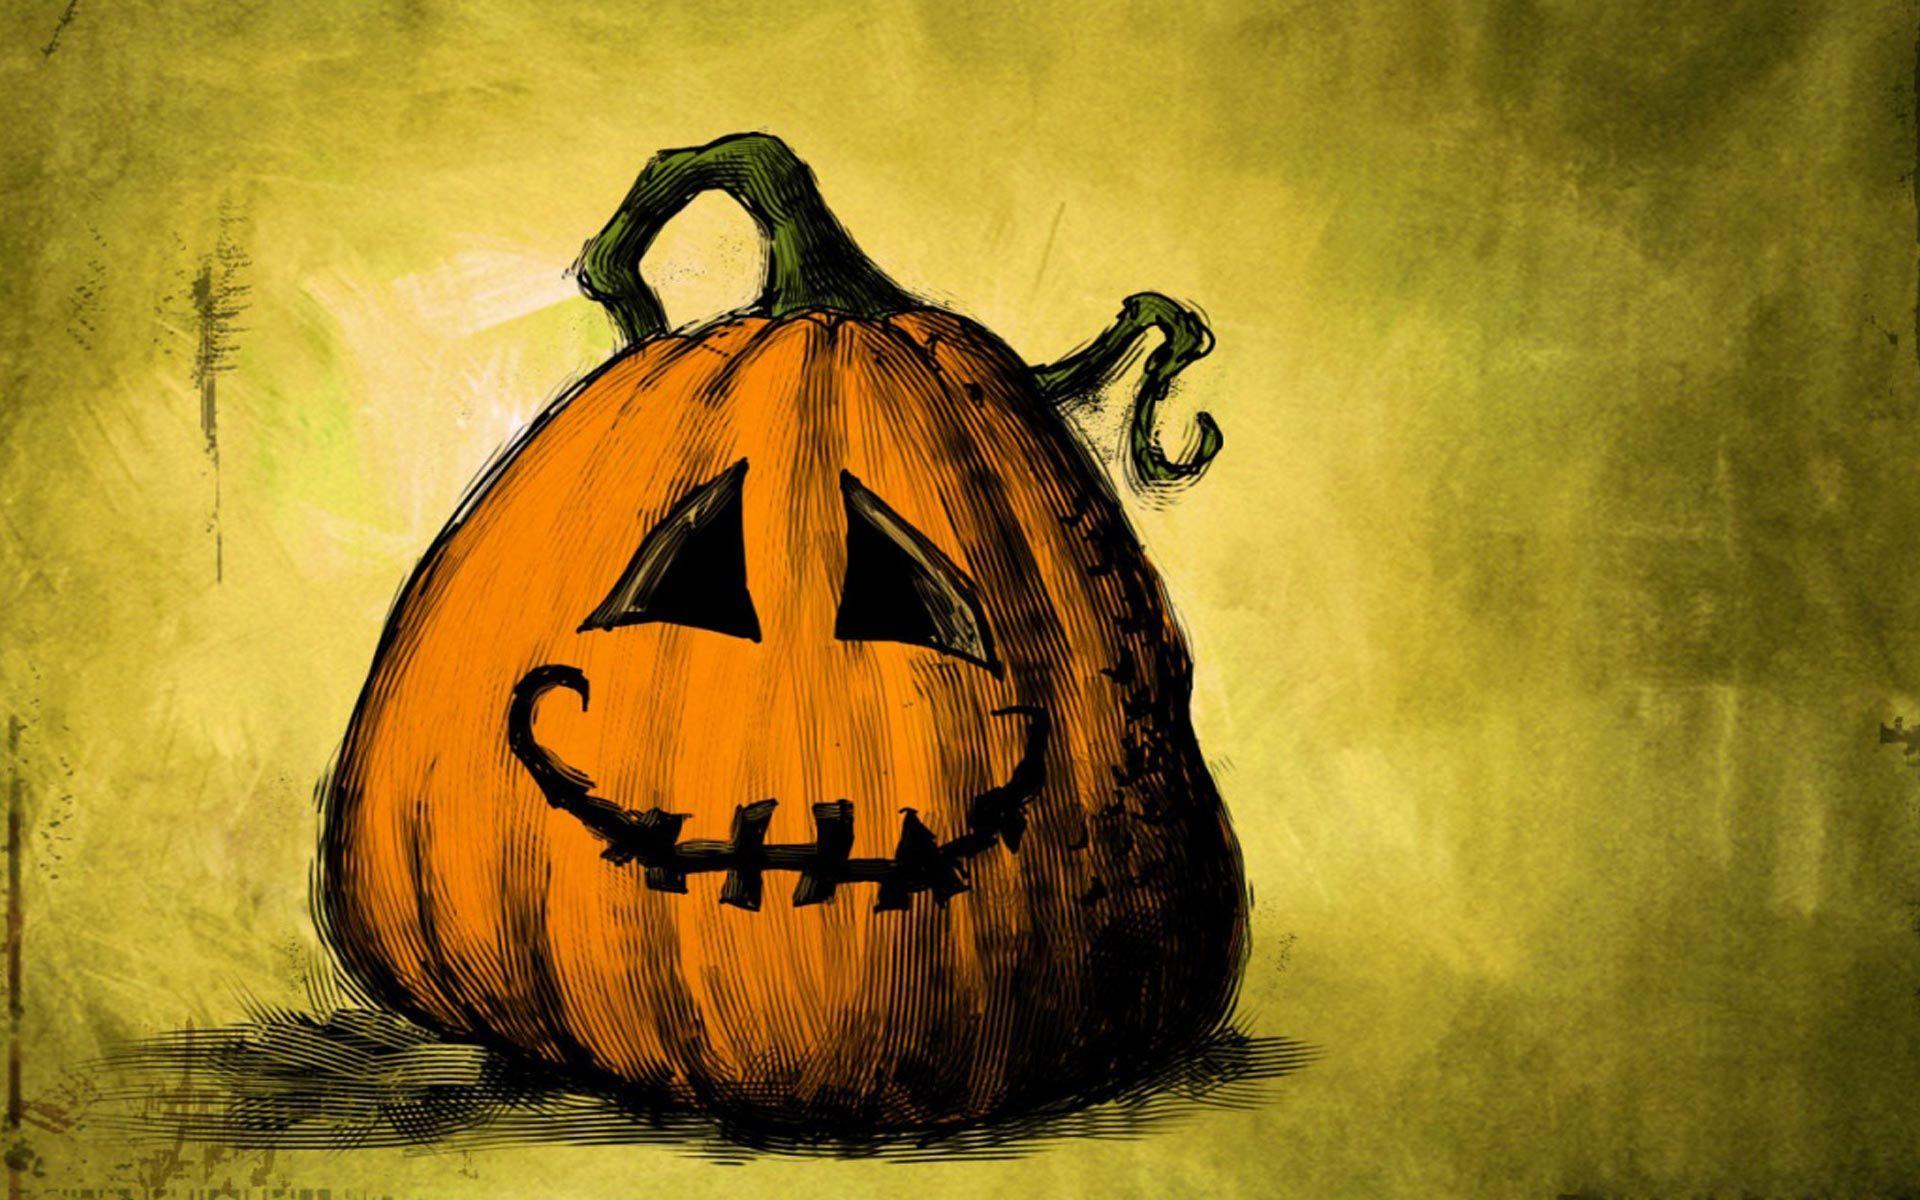 Хэллоуин 2014  - Изображение 1